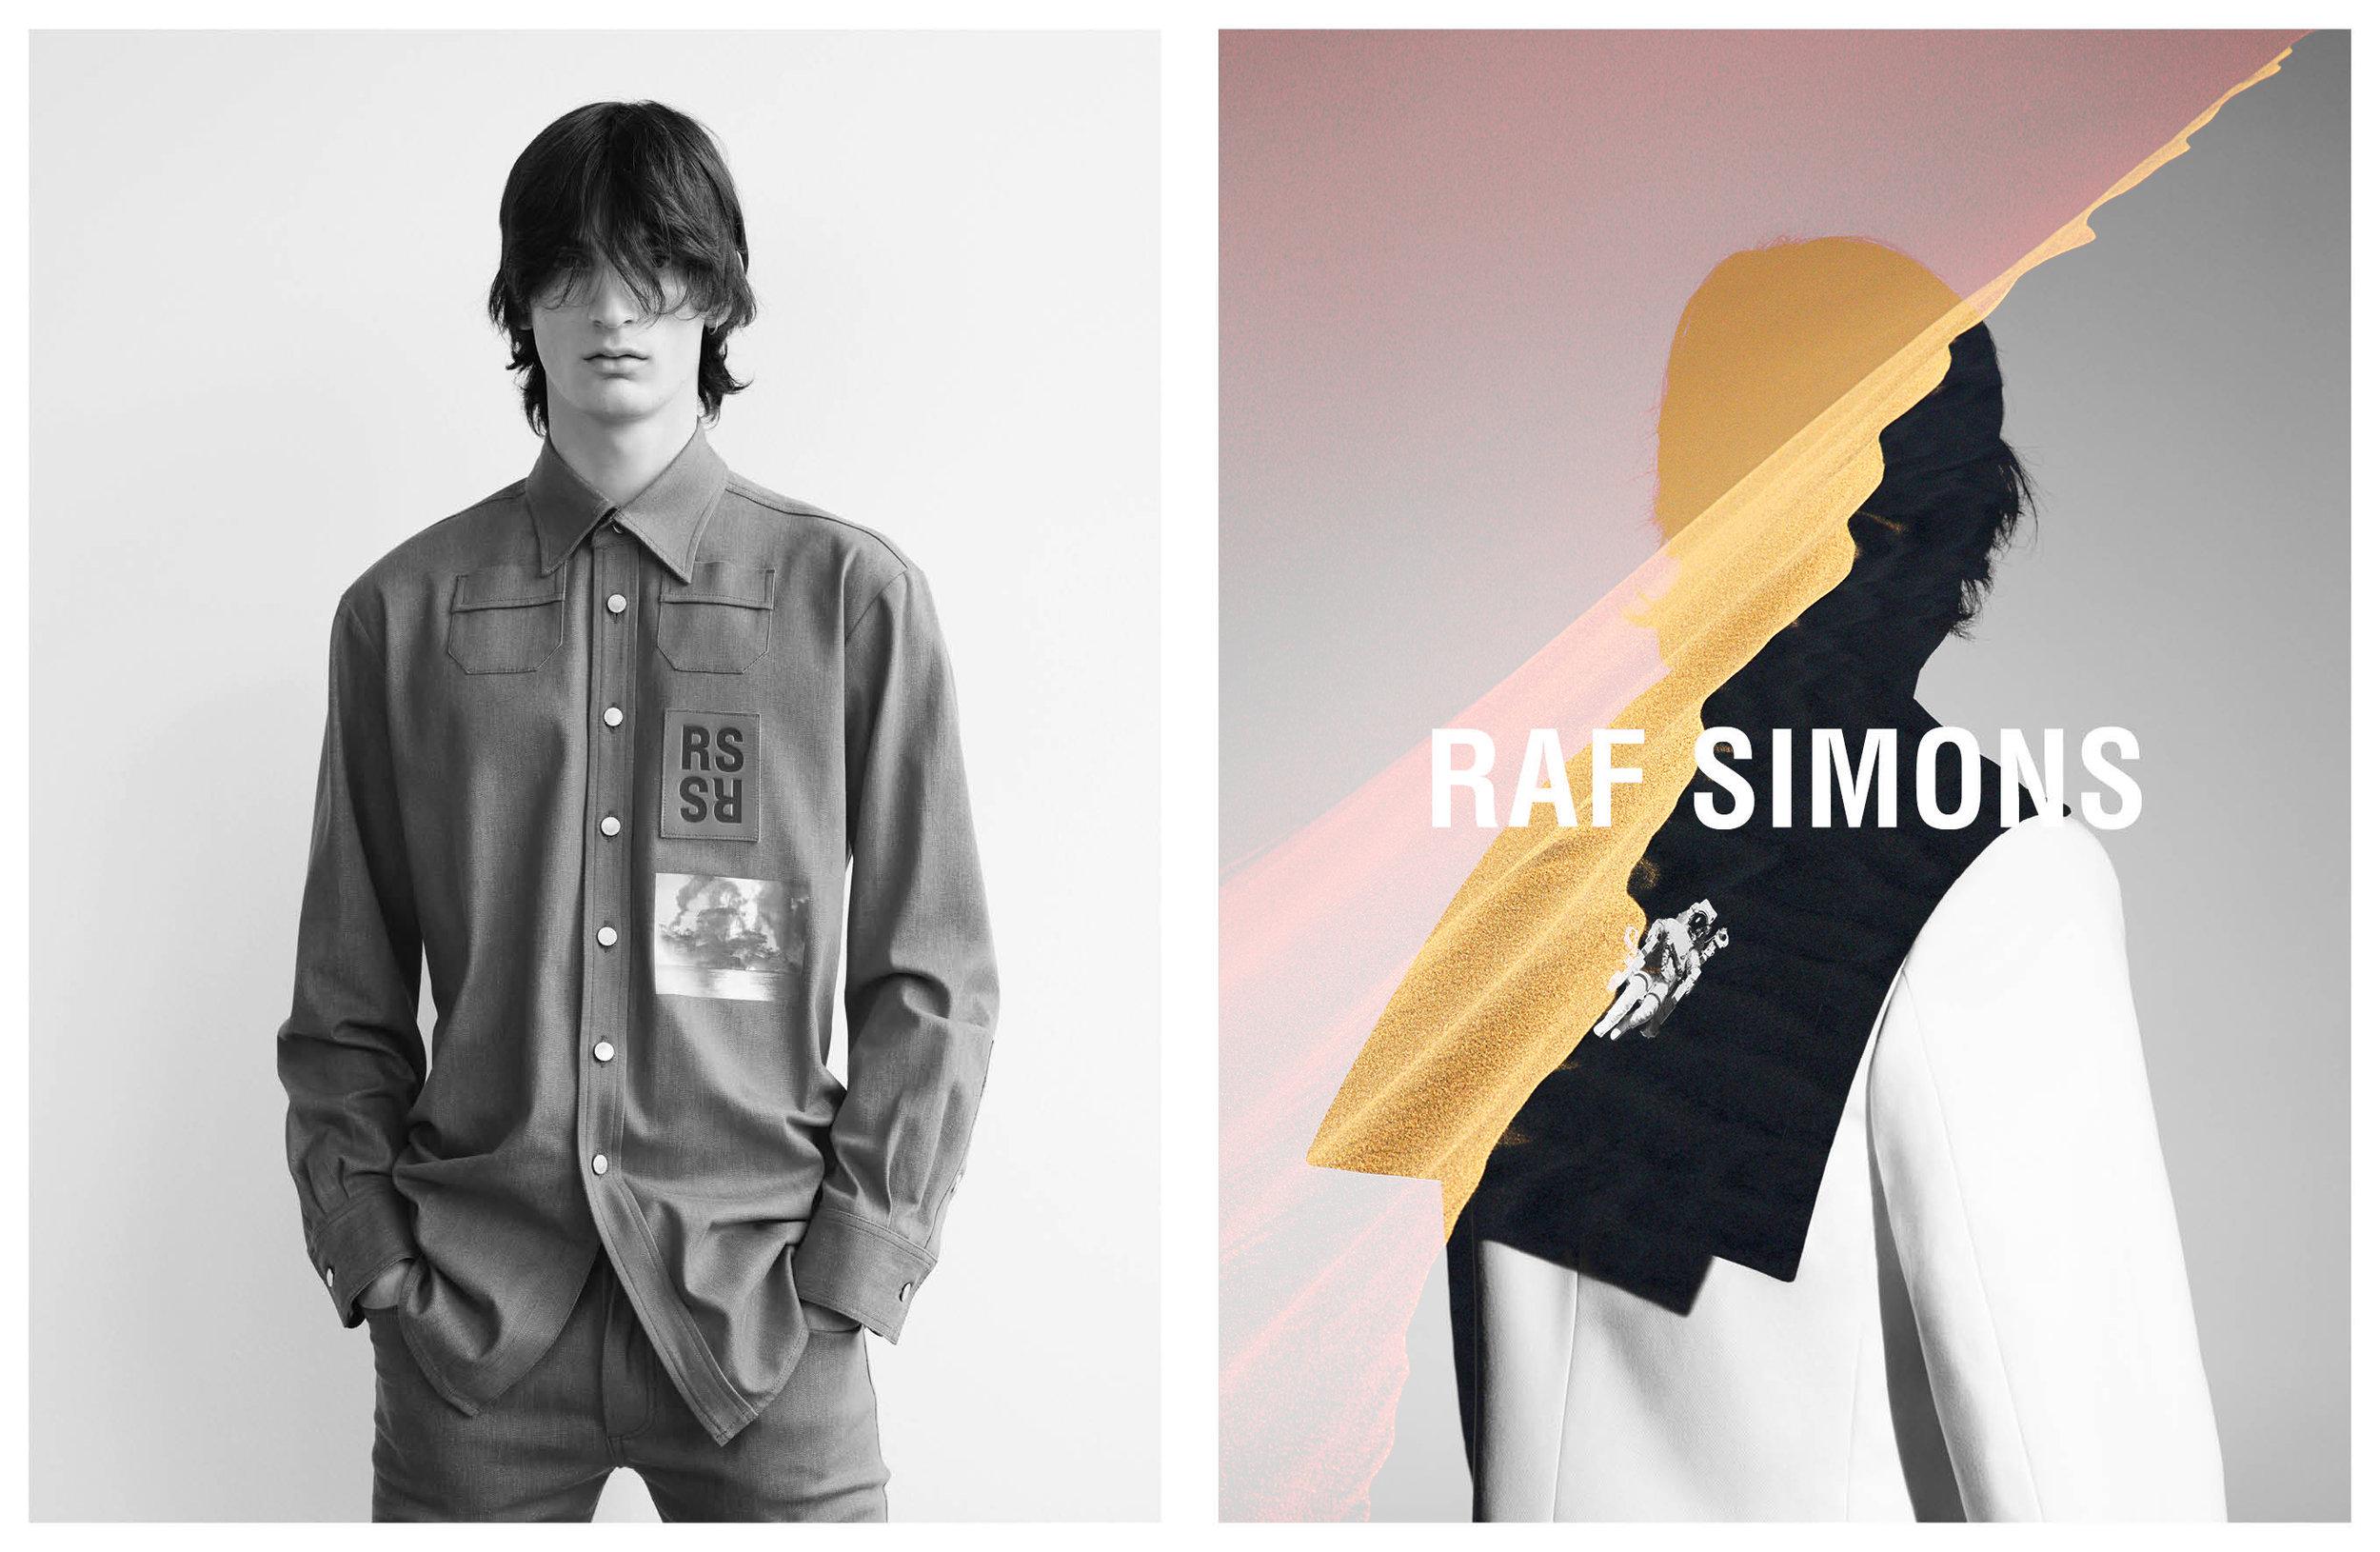 raf-simons-3_blog-1_storm_1.jpgghh.jpg